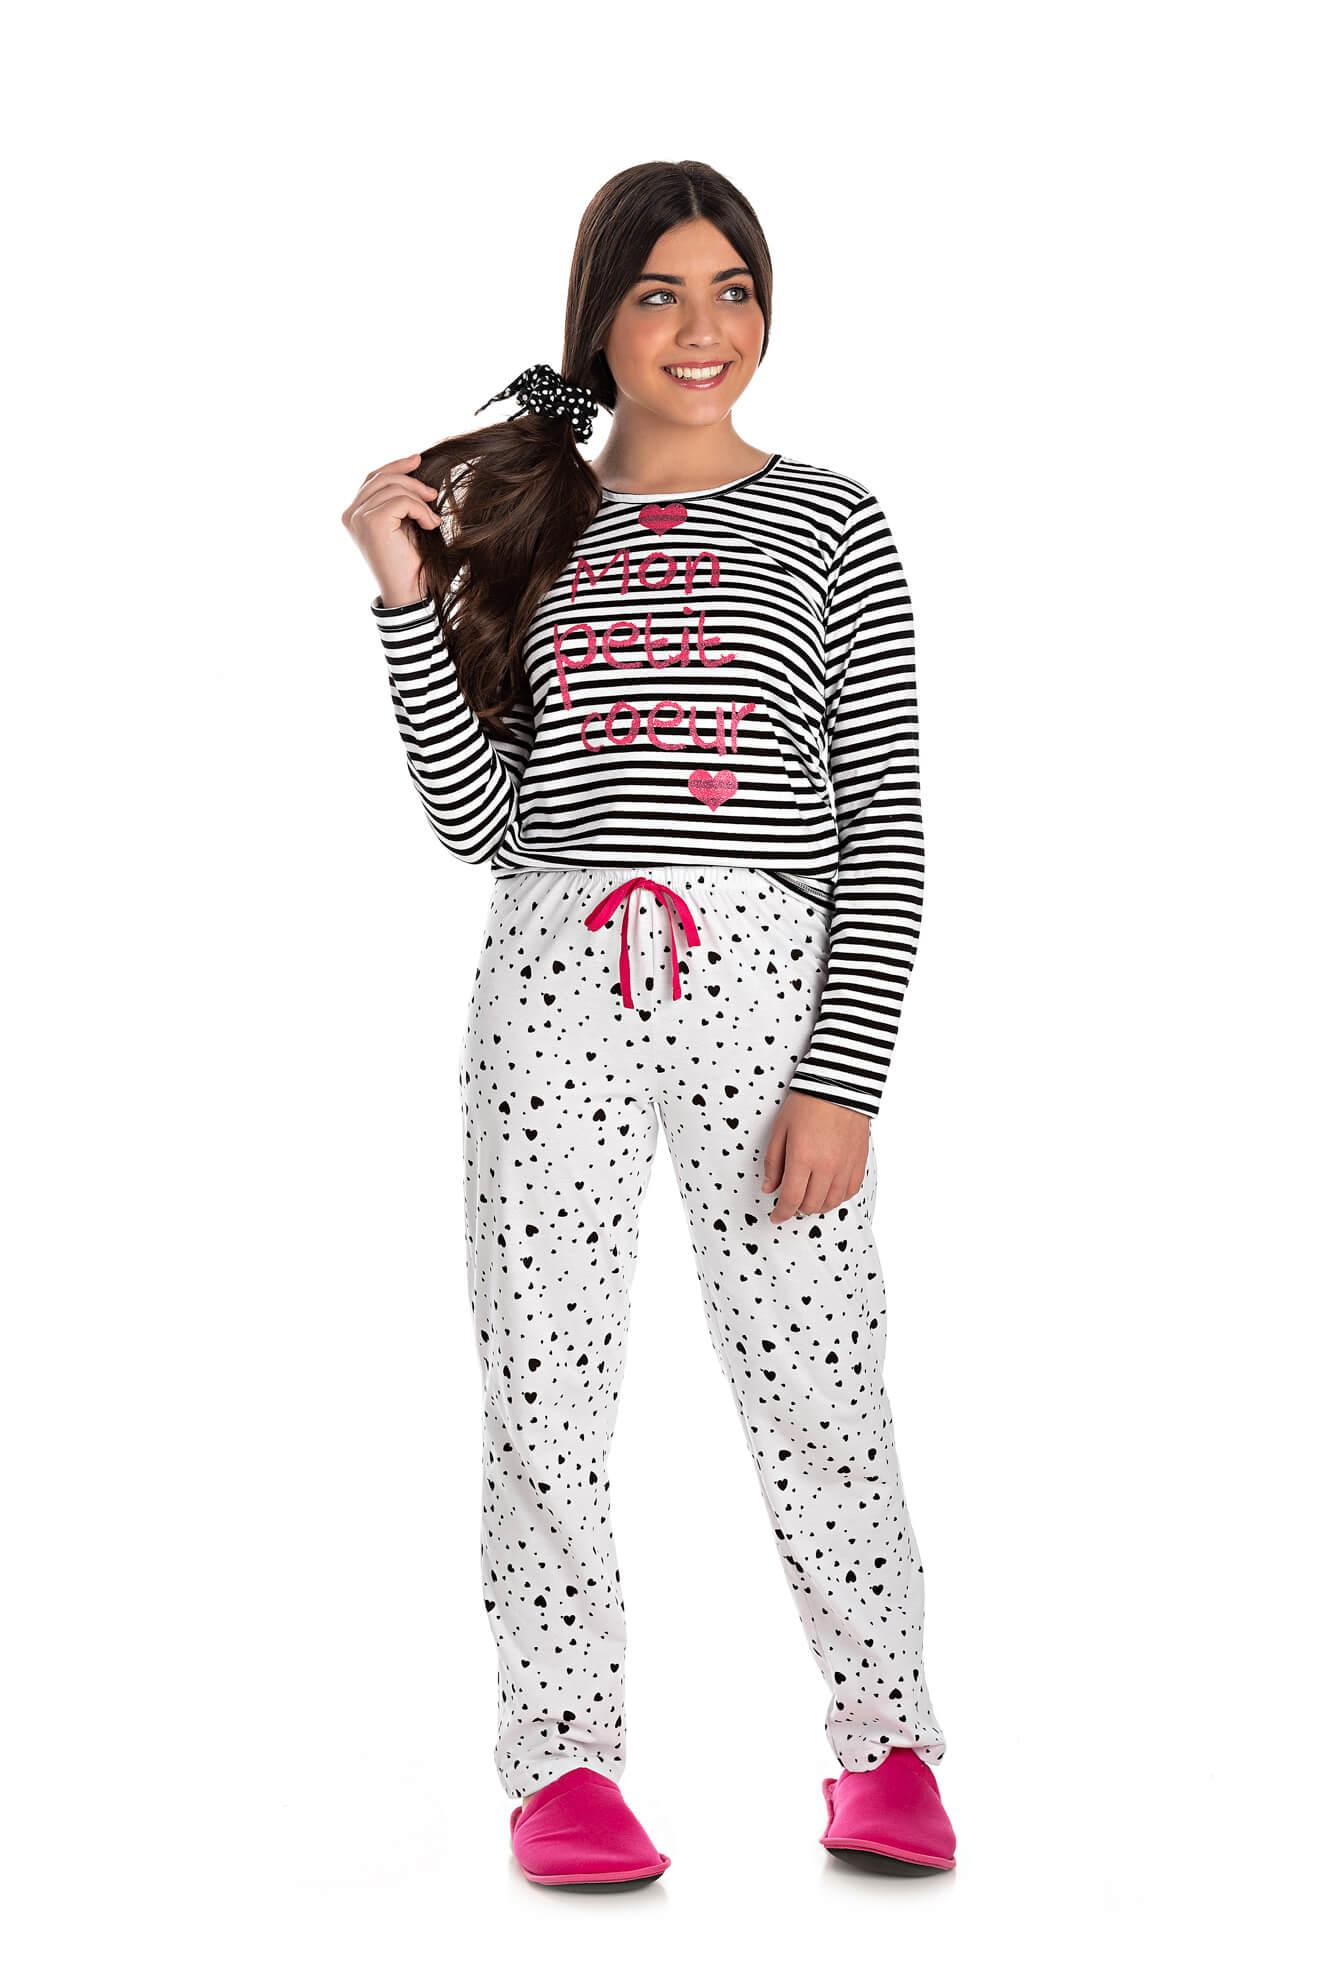 008/B - Pijama Juvenil Feminino Mon Petit Coeur